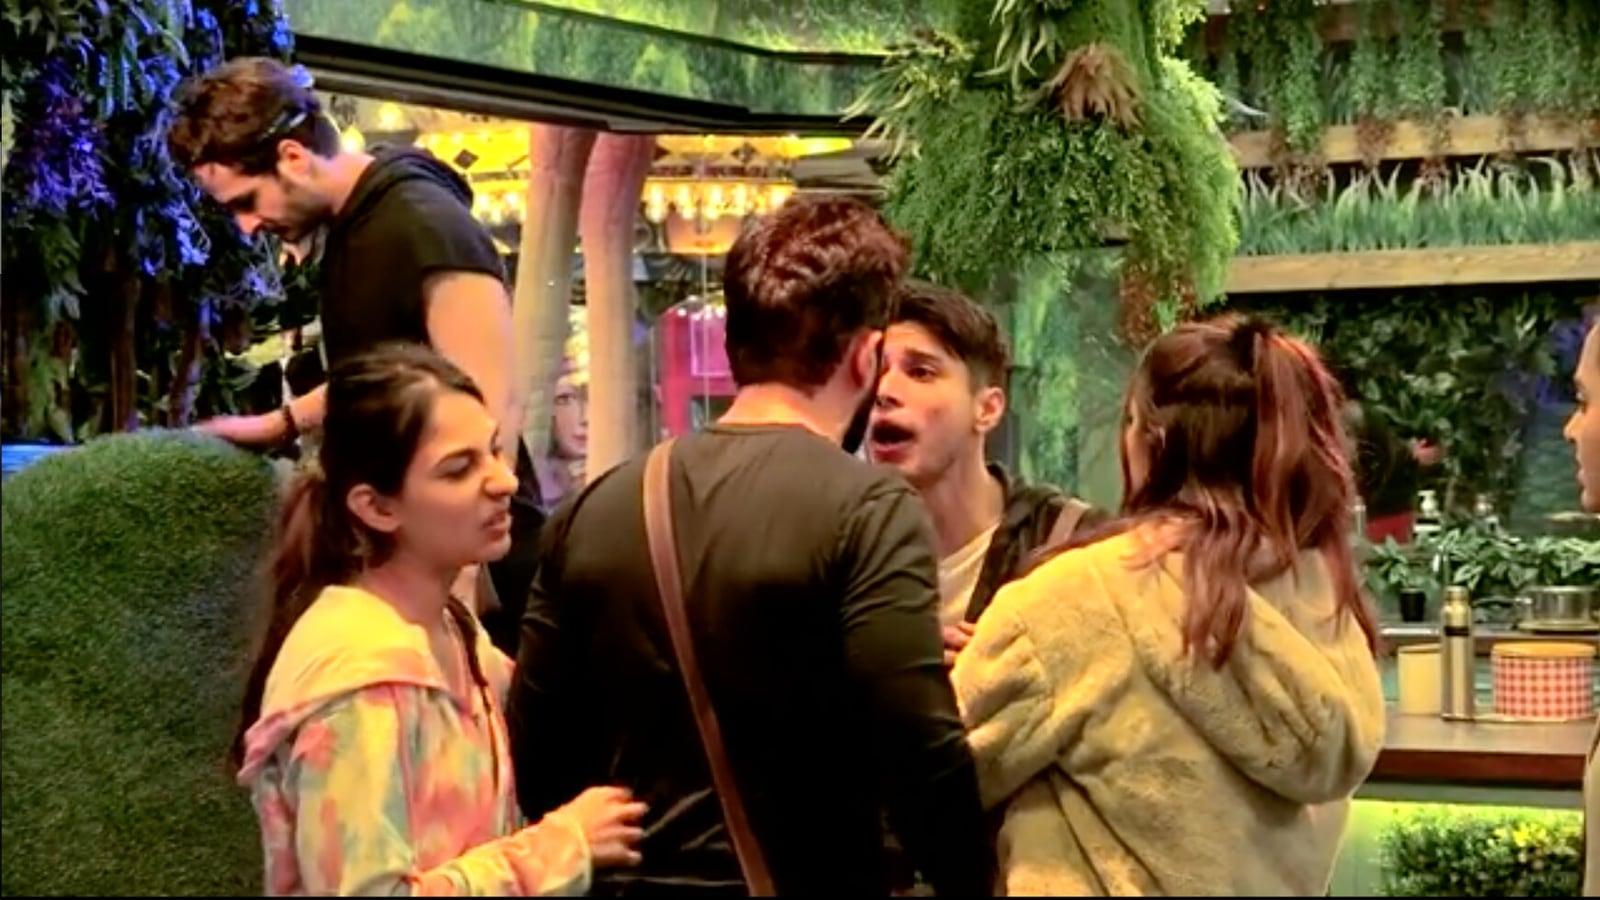 Bigg Boss 15: Twitter supports Pratik Sehajpal after Jay Bhanushali calls  him dedh futiya: 'Salman Khan has same height' - Hindustan Times